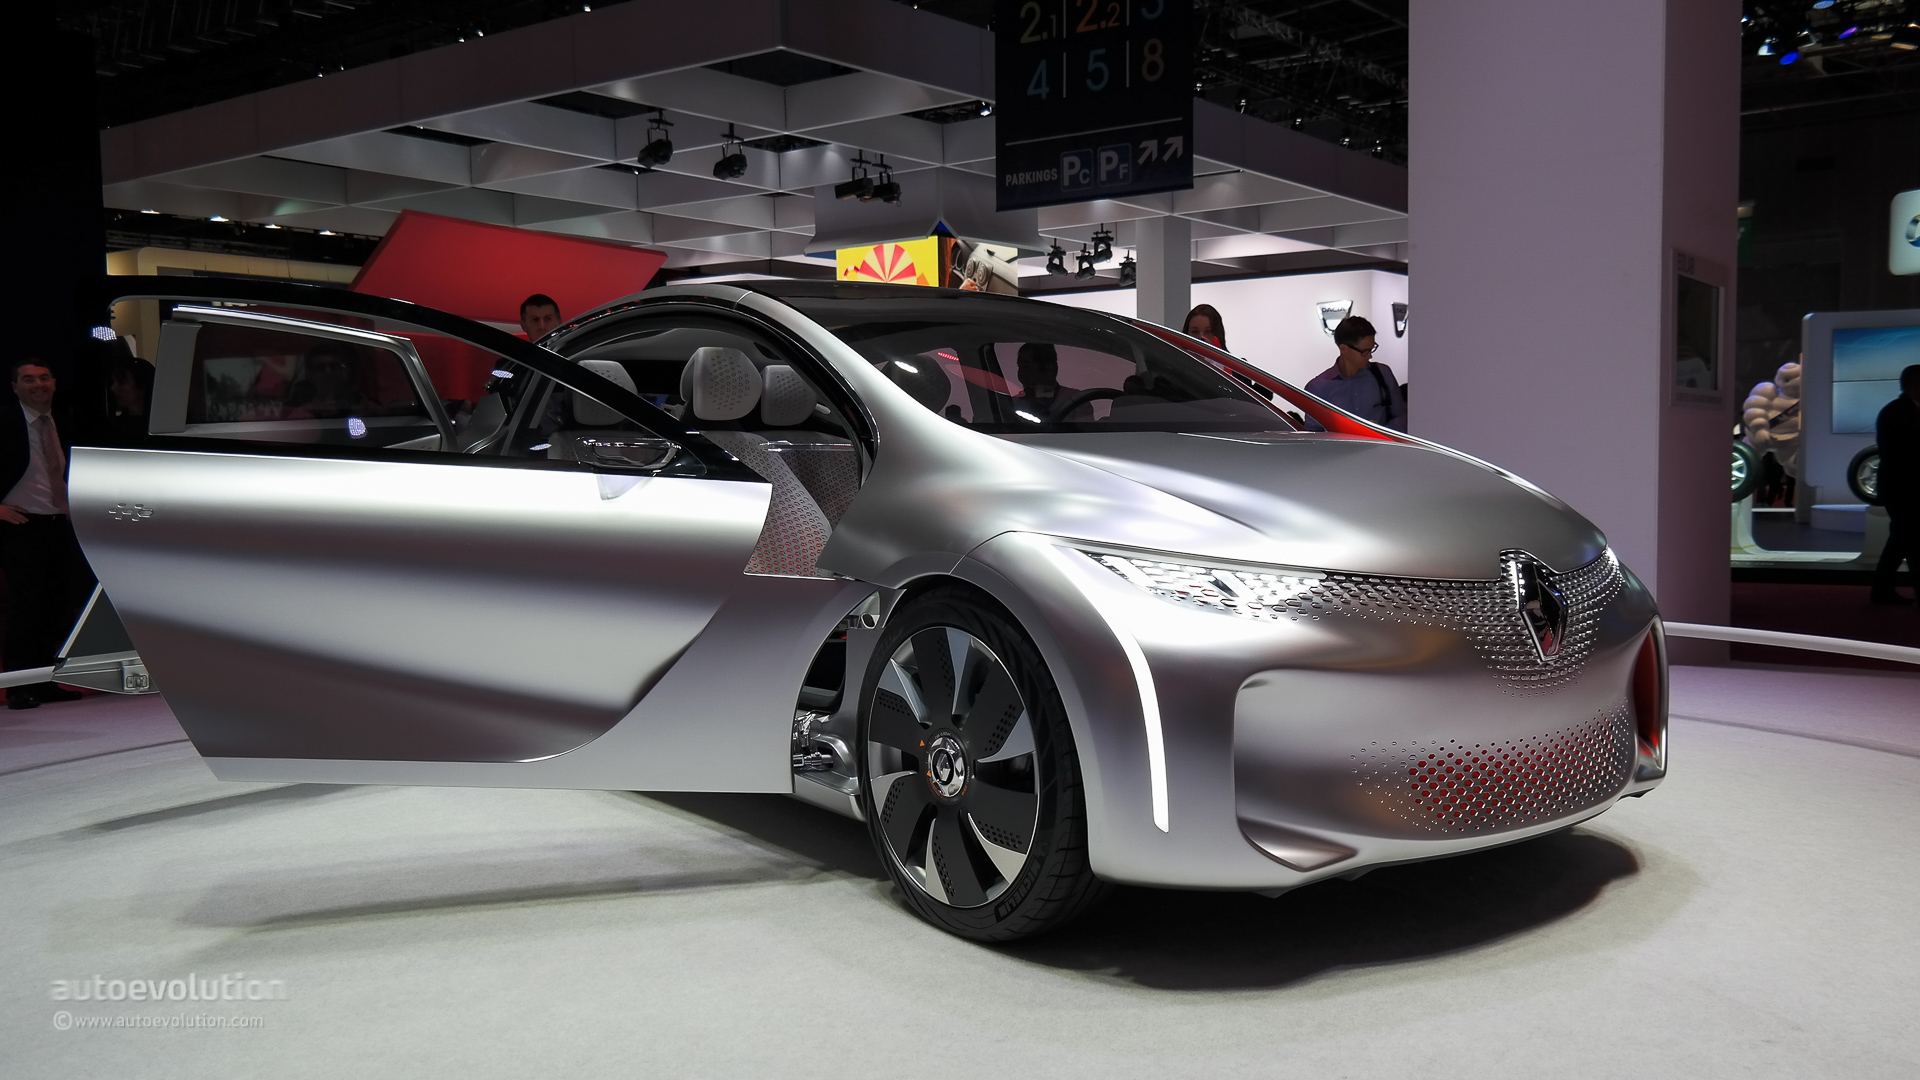 Renault eolab shows us the future at paris motor show 2014 live photos autoevolution - Paris motor show ...